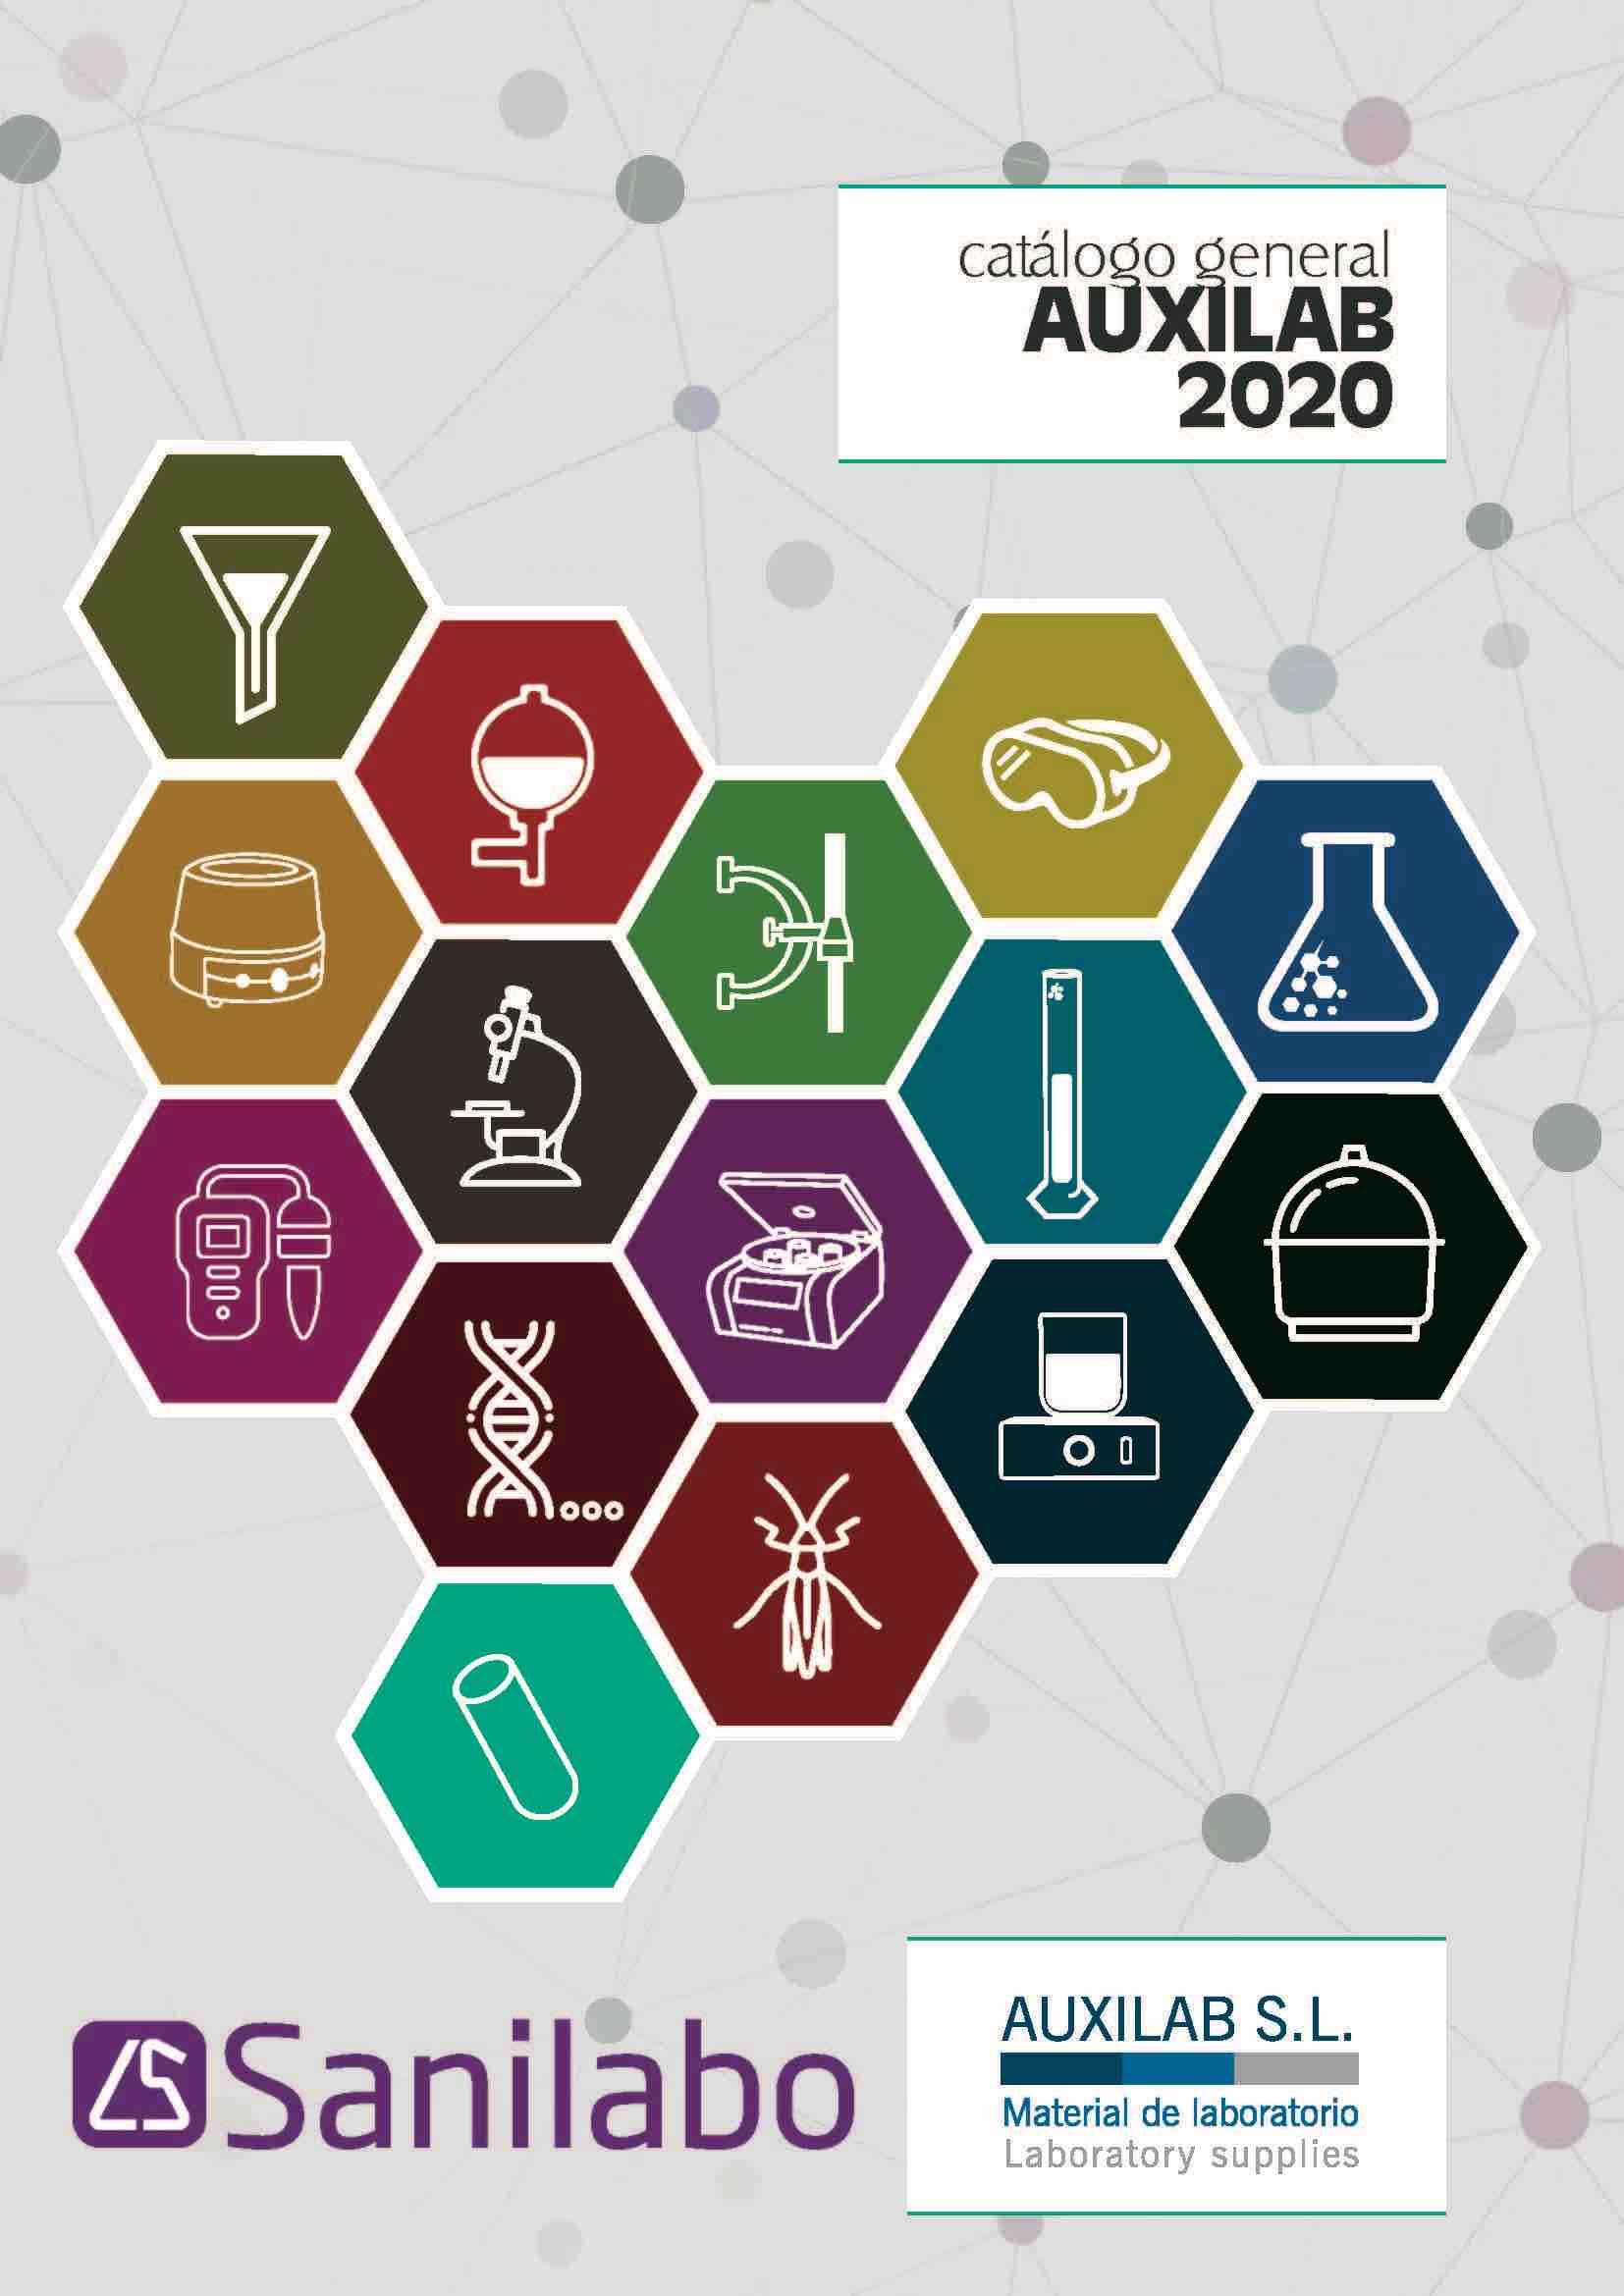 Catalogo-Laboratorio-Auxilab-2020-SANILABO